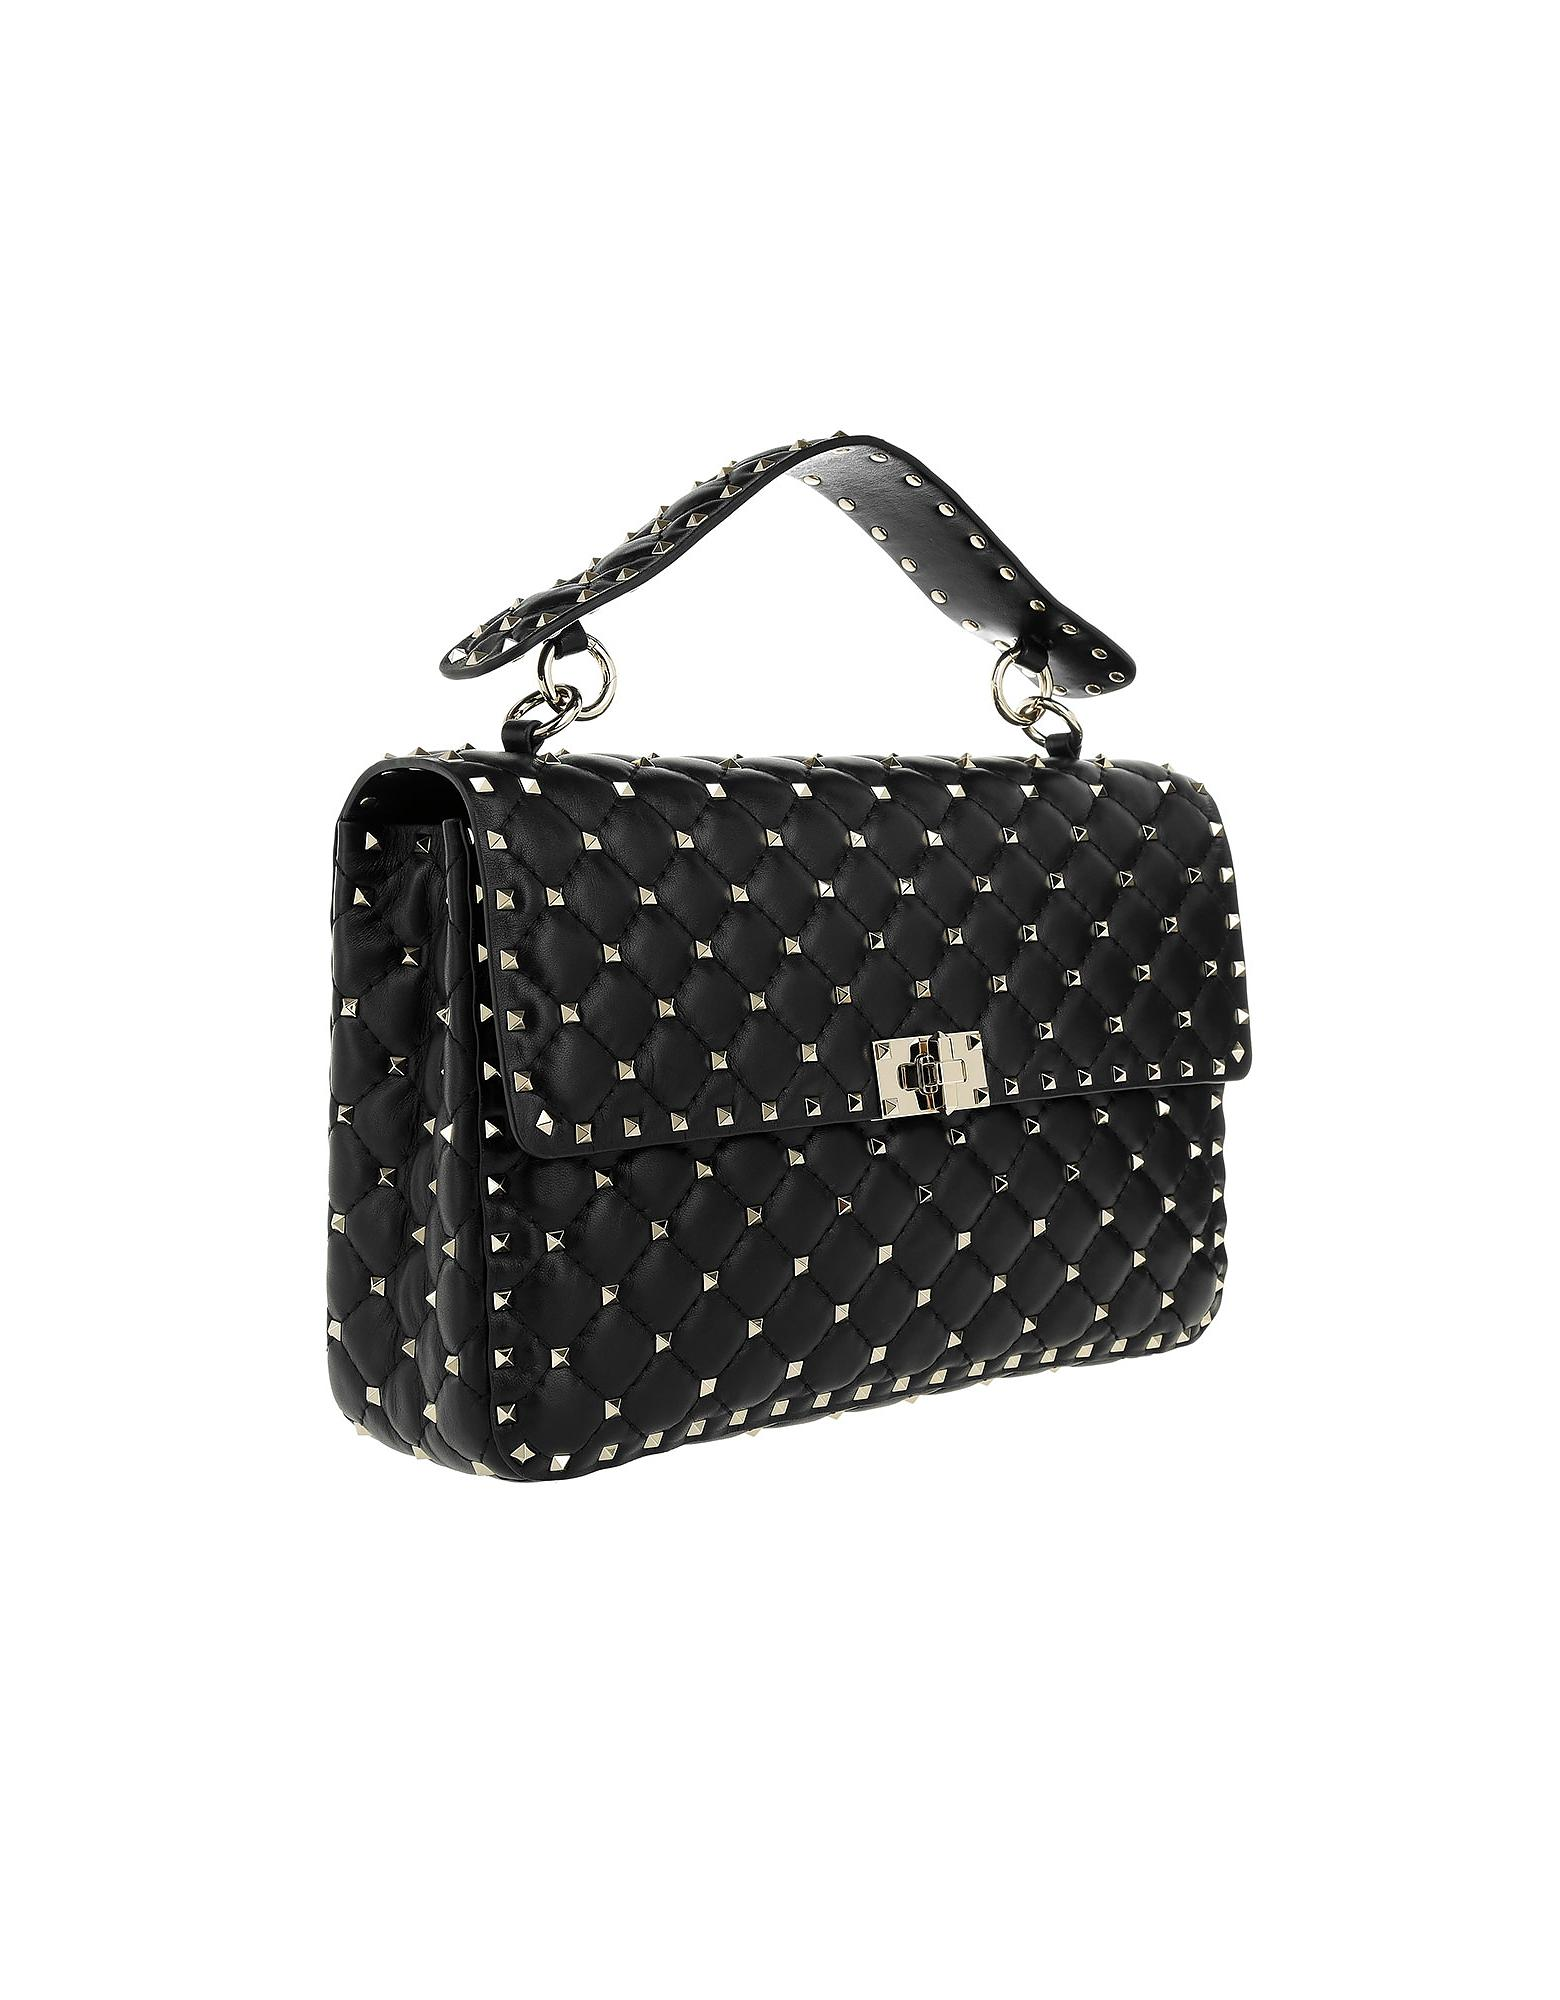 070bd33620ce Lyst - Valentino Rockstud Spike Nappa Large Crossbody Bag Black in Black